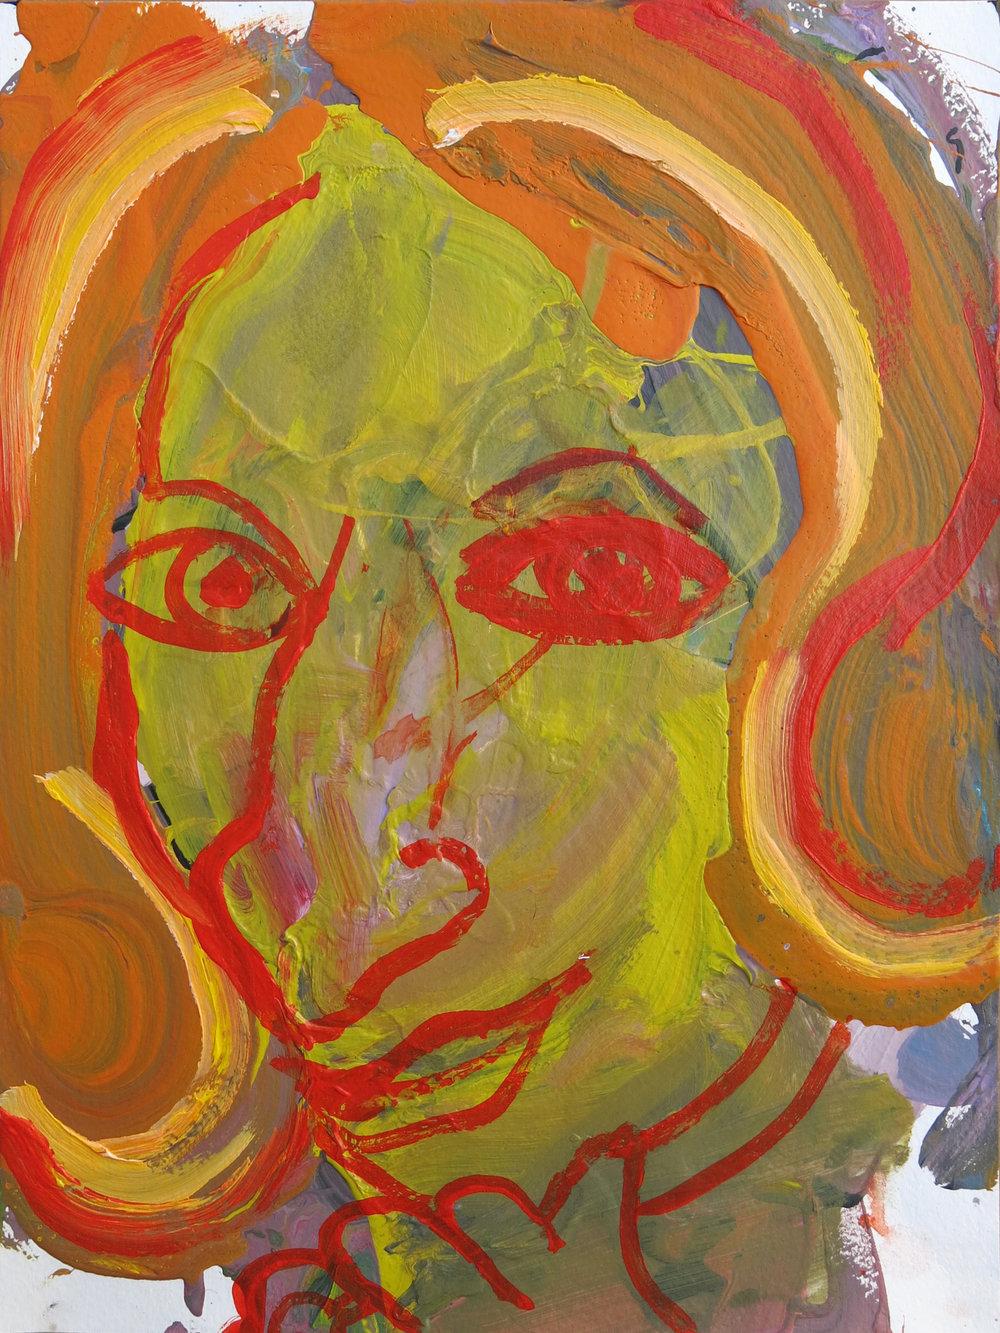 Barbra Streisand Portrait #112